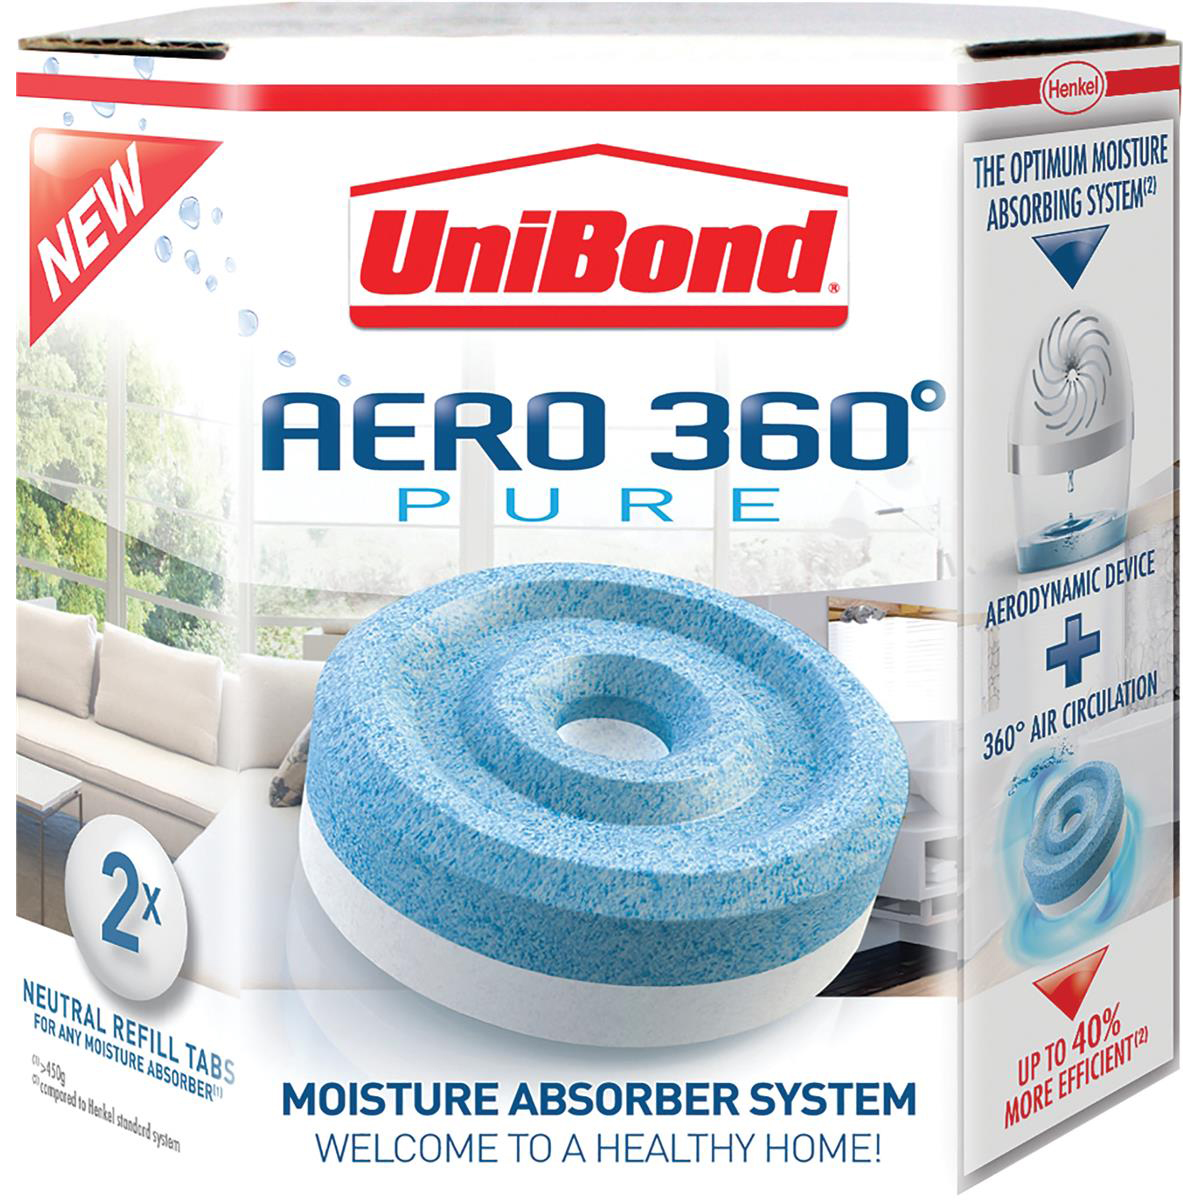 UniBond Aero 360 Moisture Absorber Refill Pure Ref 2106199 Pack 4